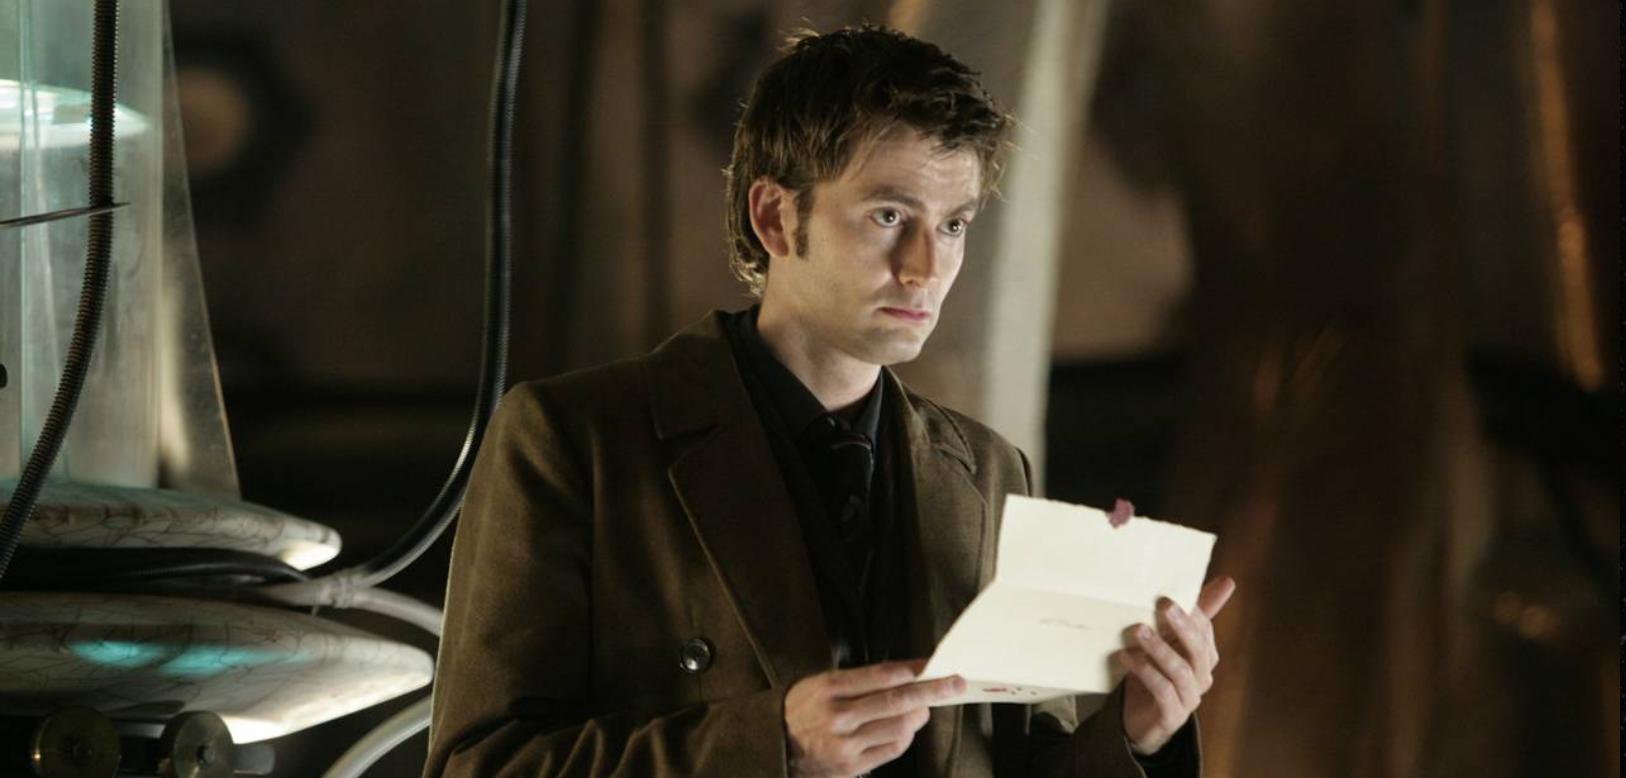 Screenshot of David Tennant as the Doctor